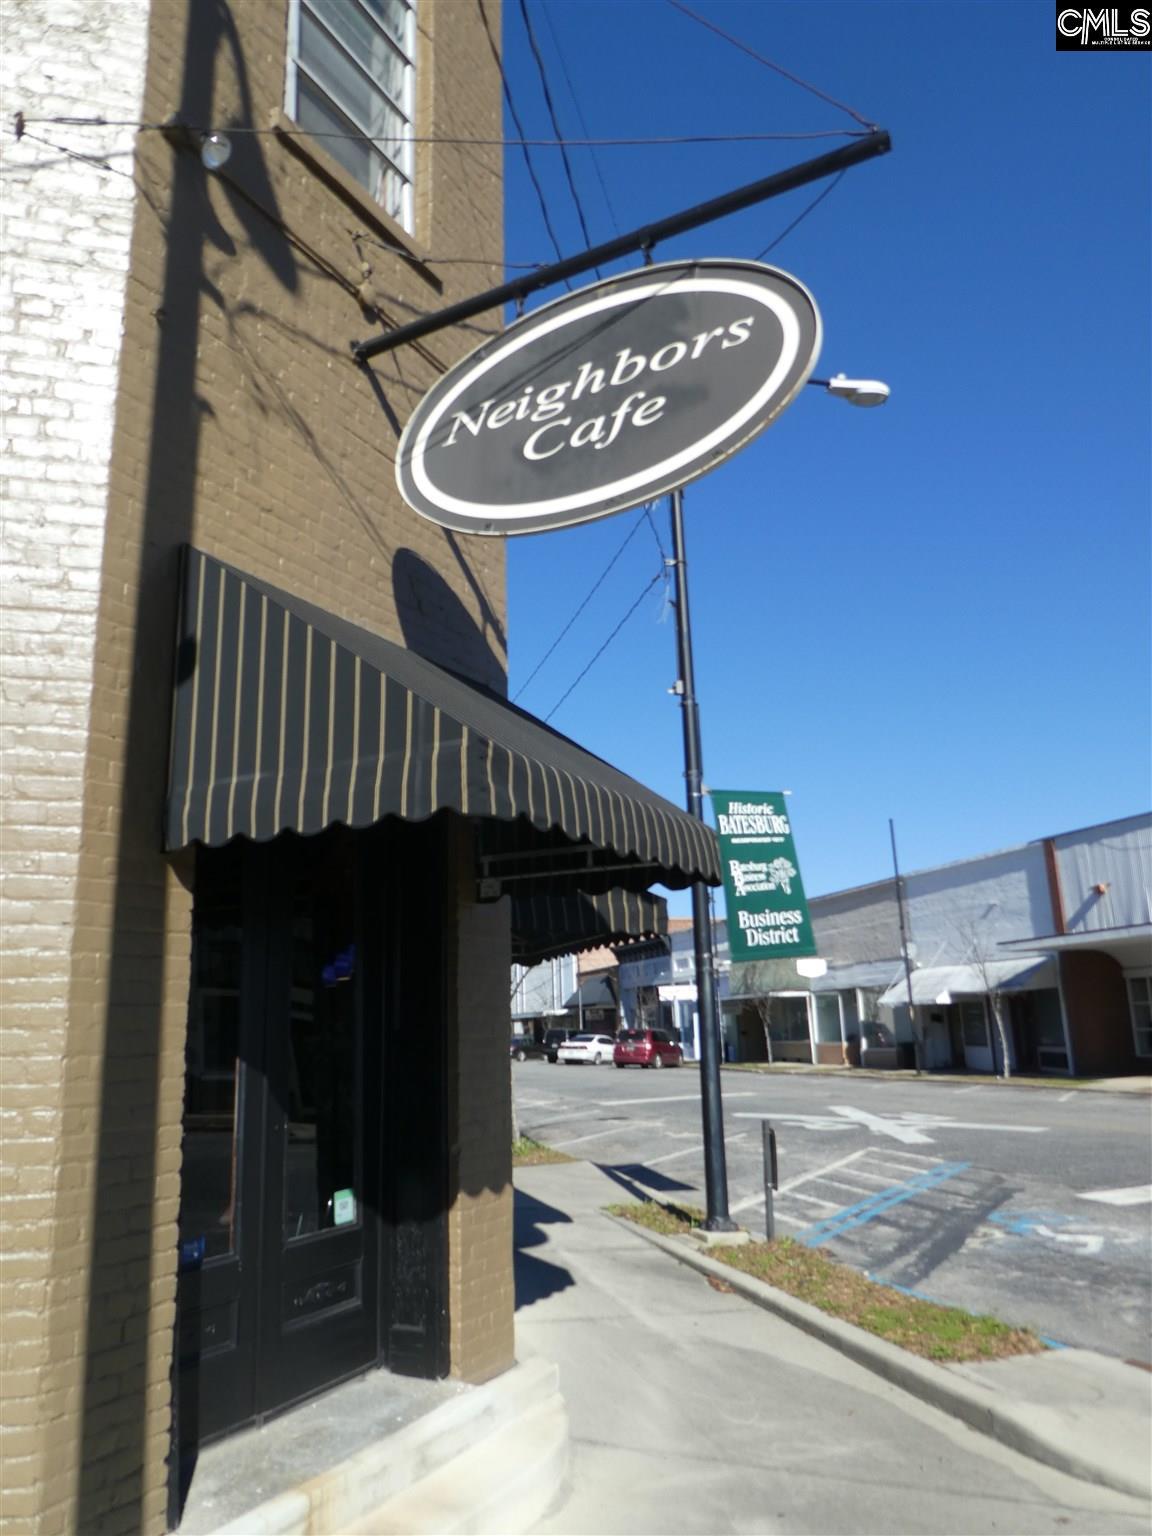 133 N Oak St Batesburg, SC 29006